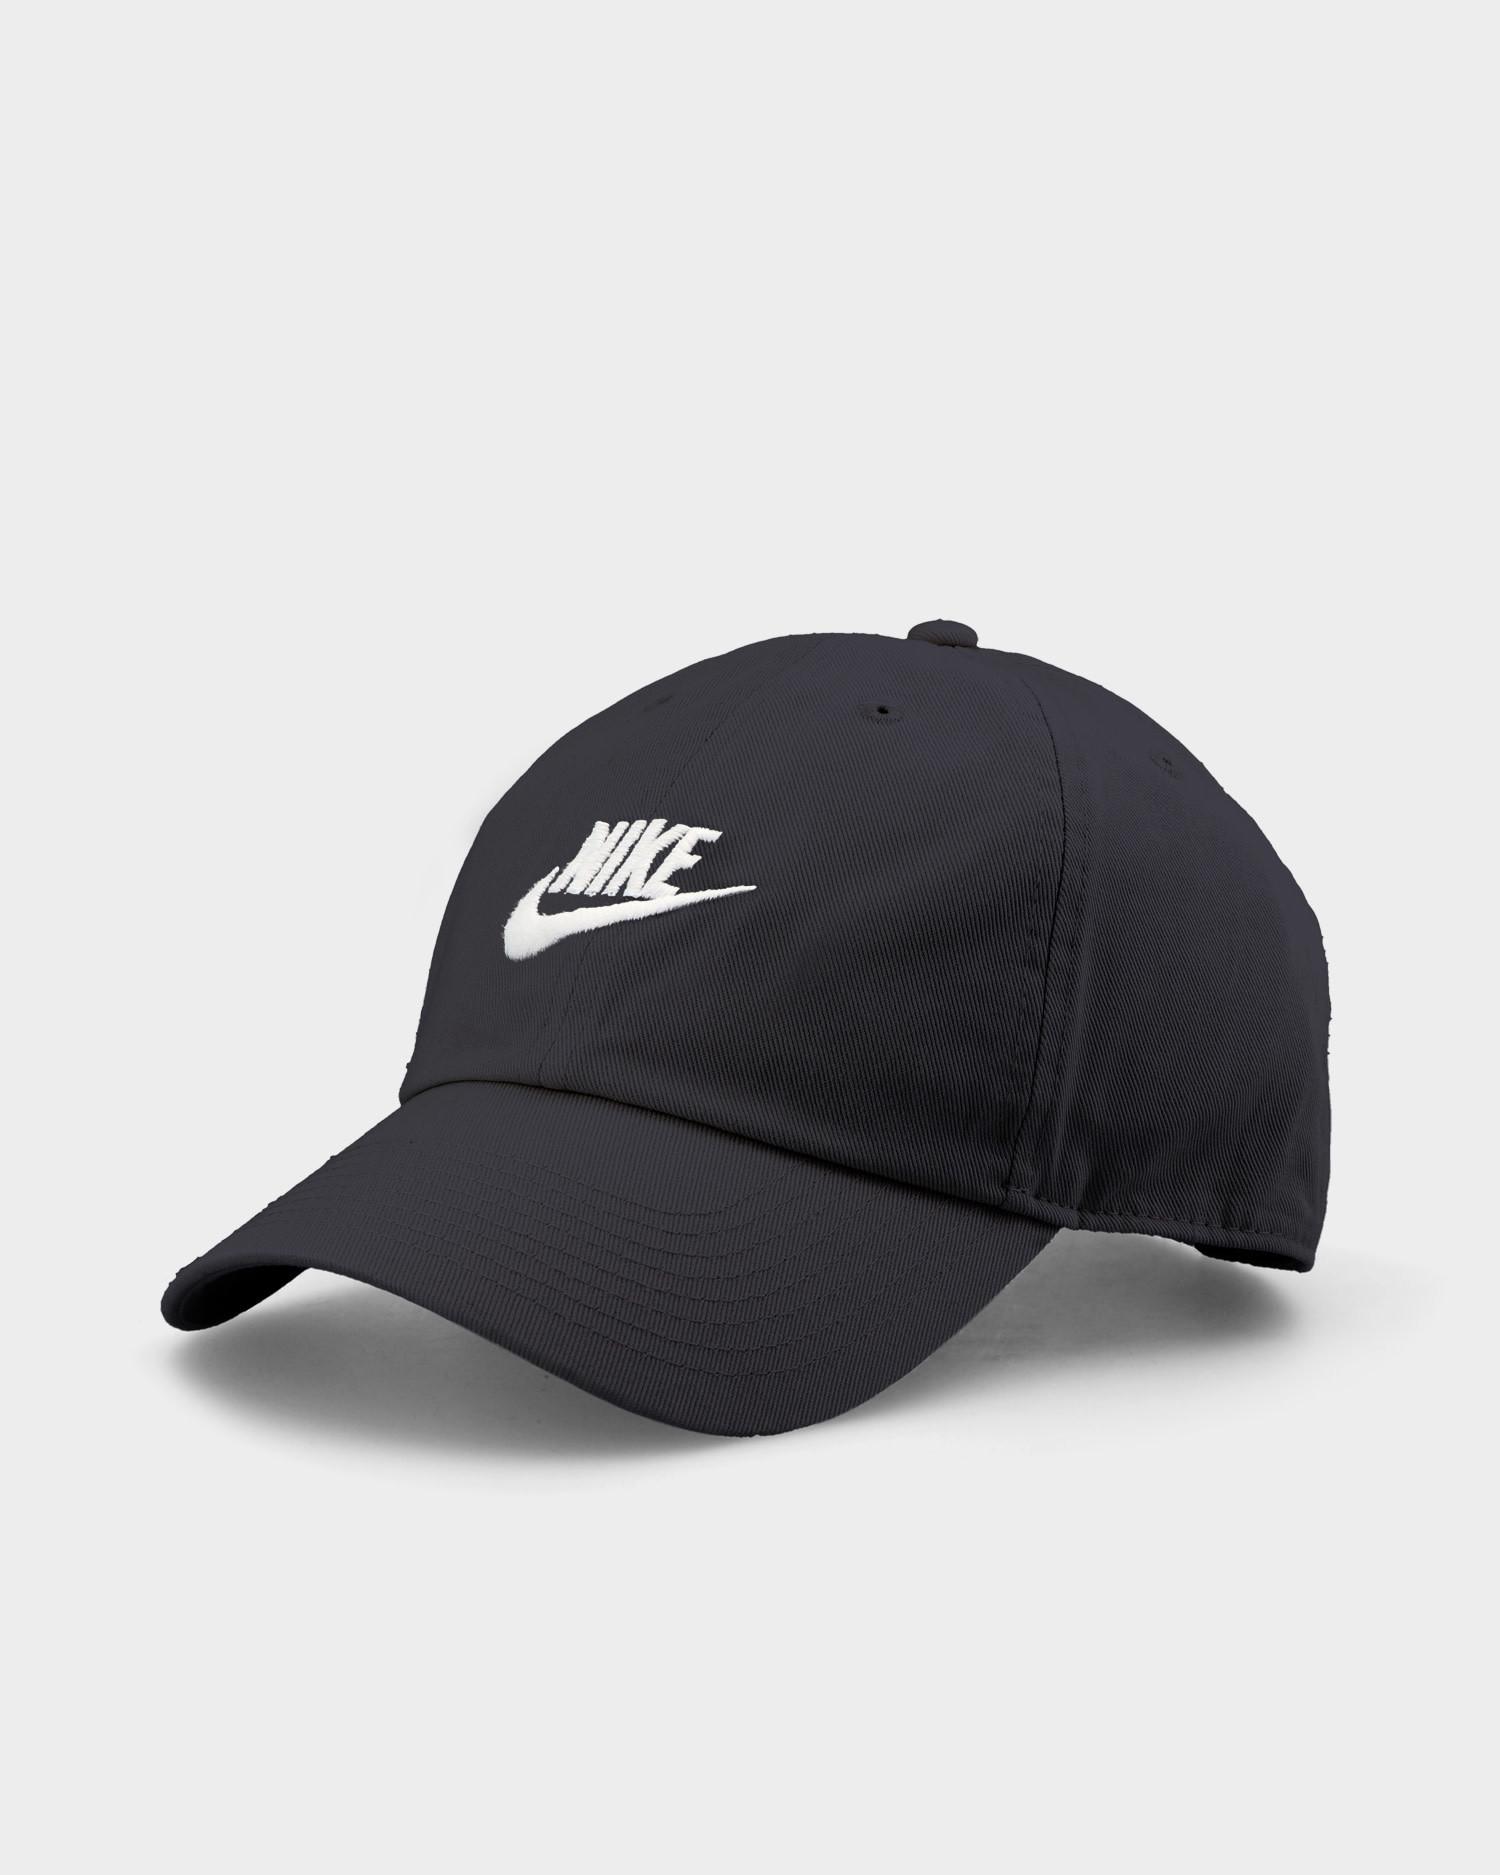 Nike Sportswear Heritage 86 Futura Washed Cap Black/Black/White